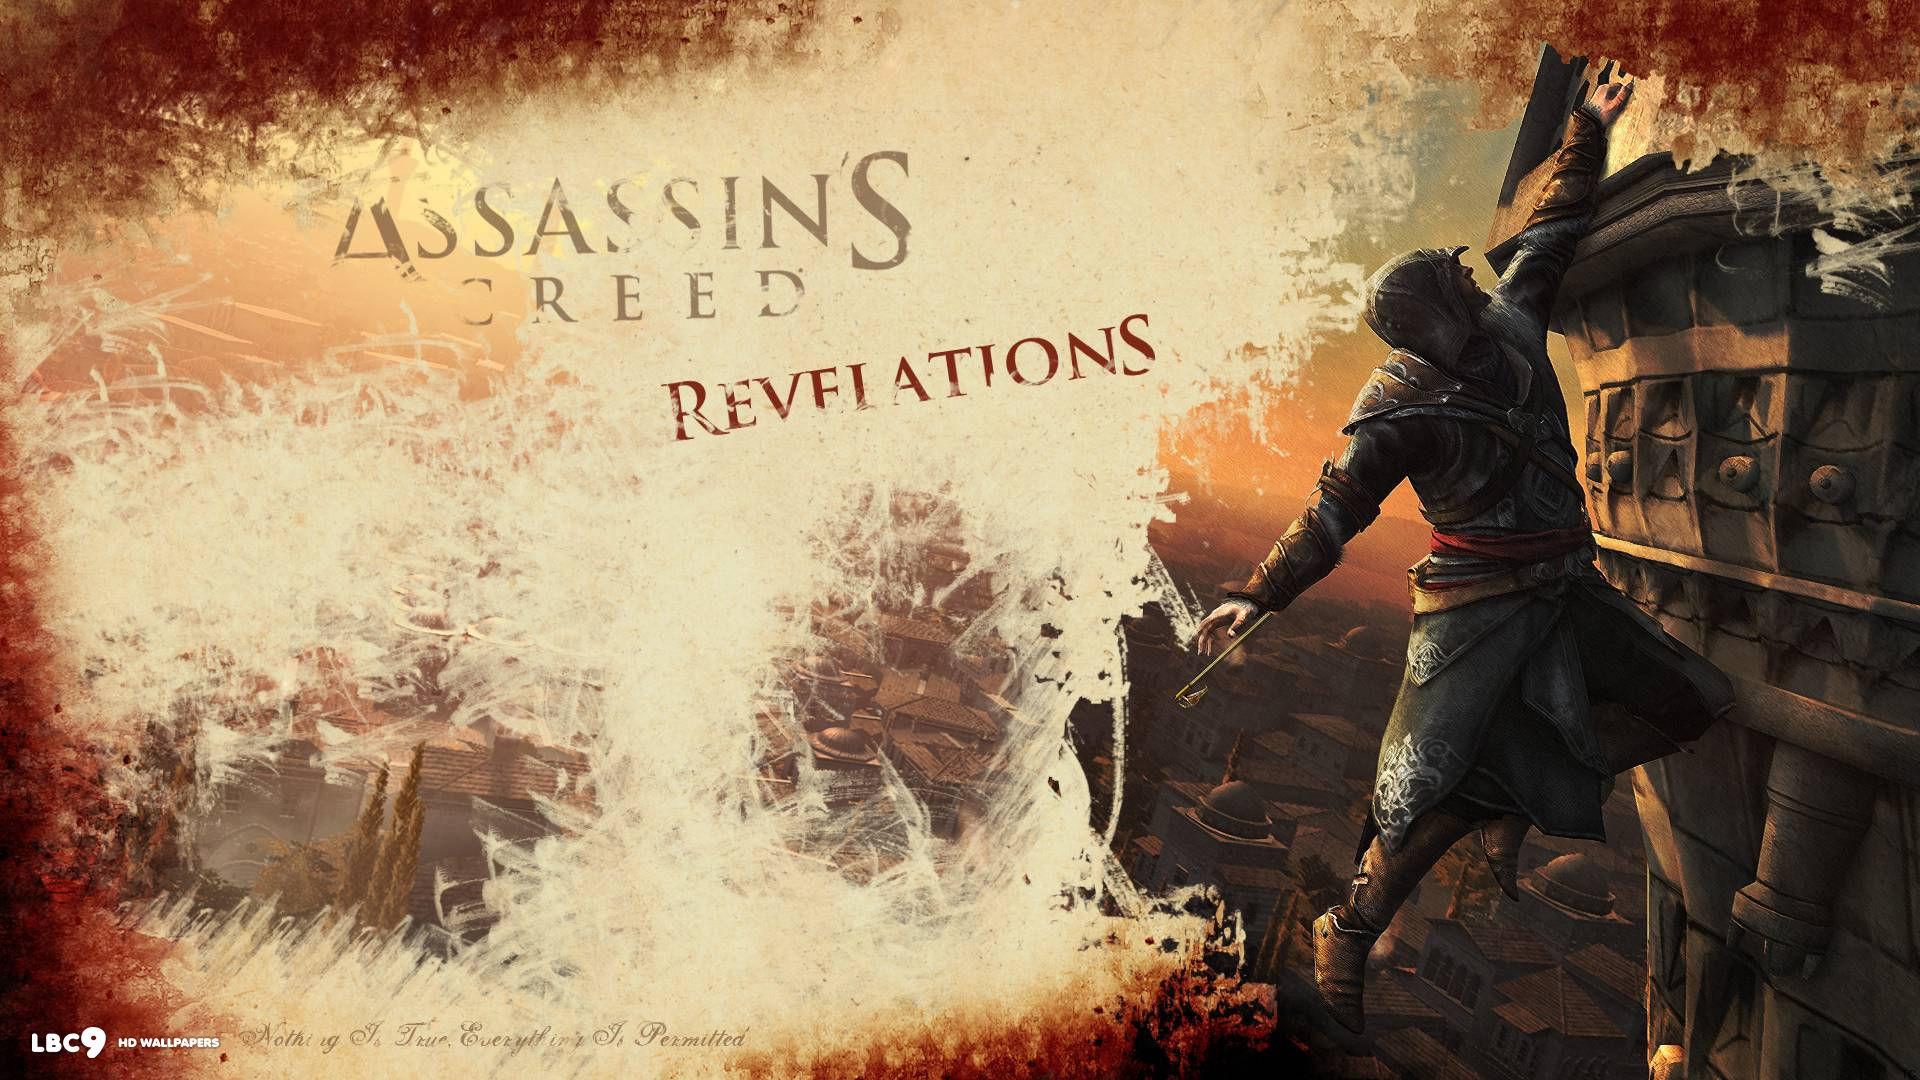 assassins creed revelations wallpaper hd